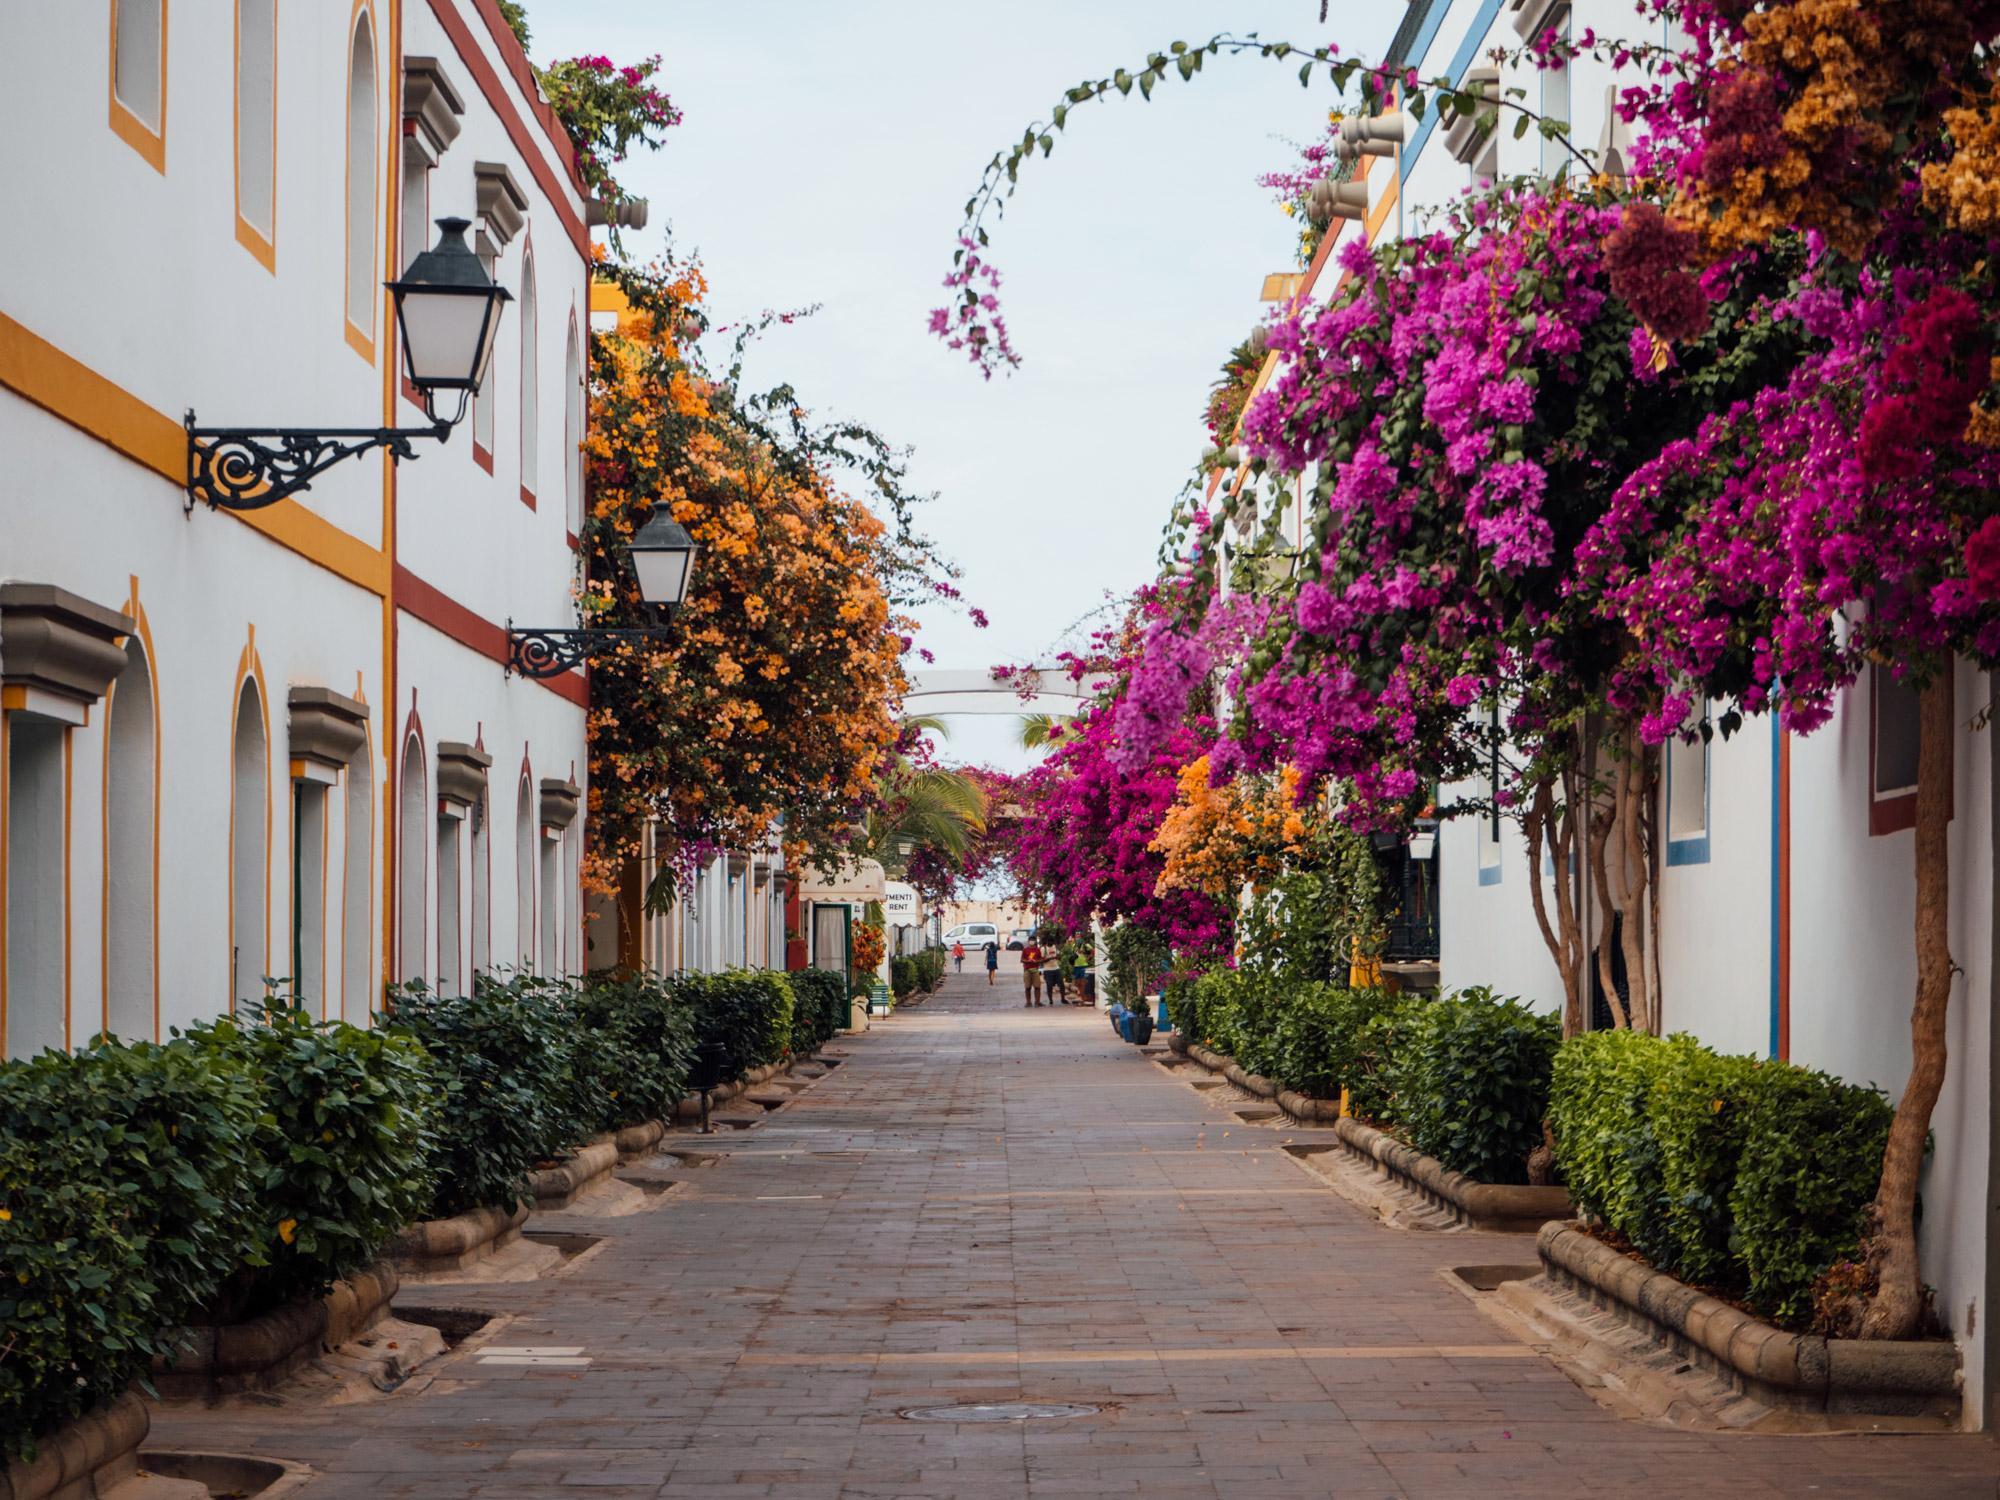 Maaike - Gran Canaria